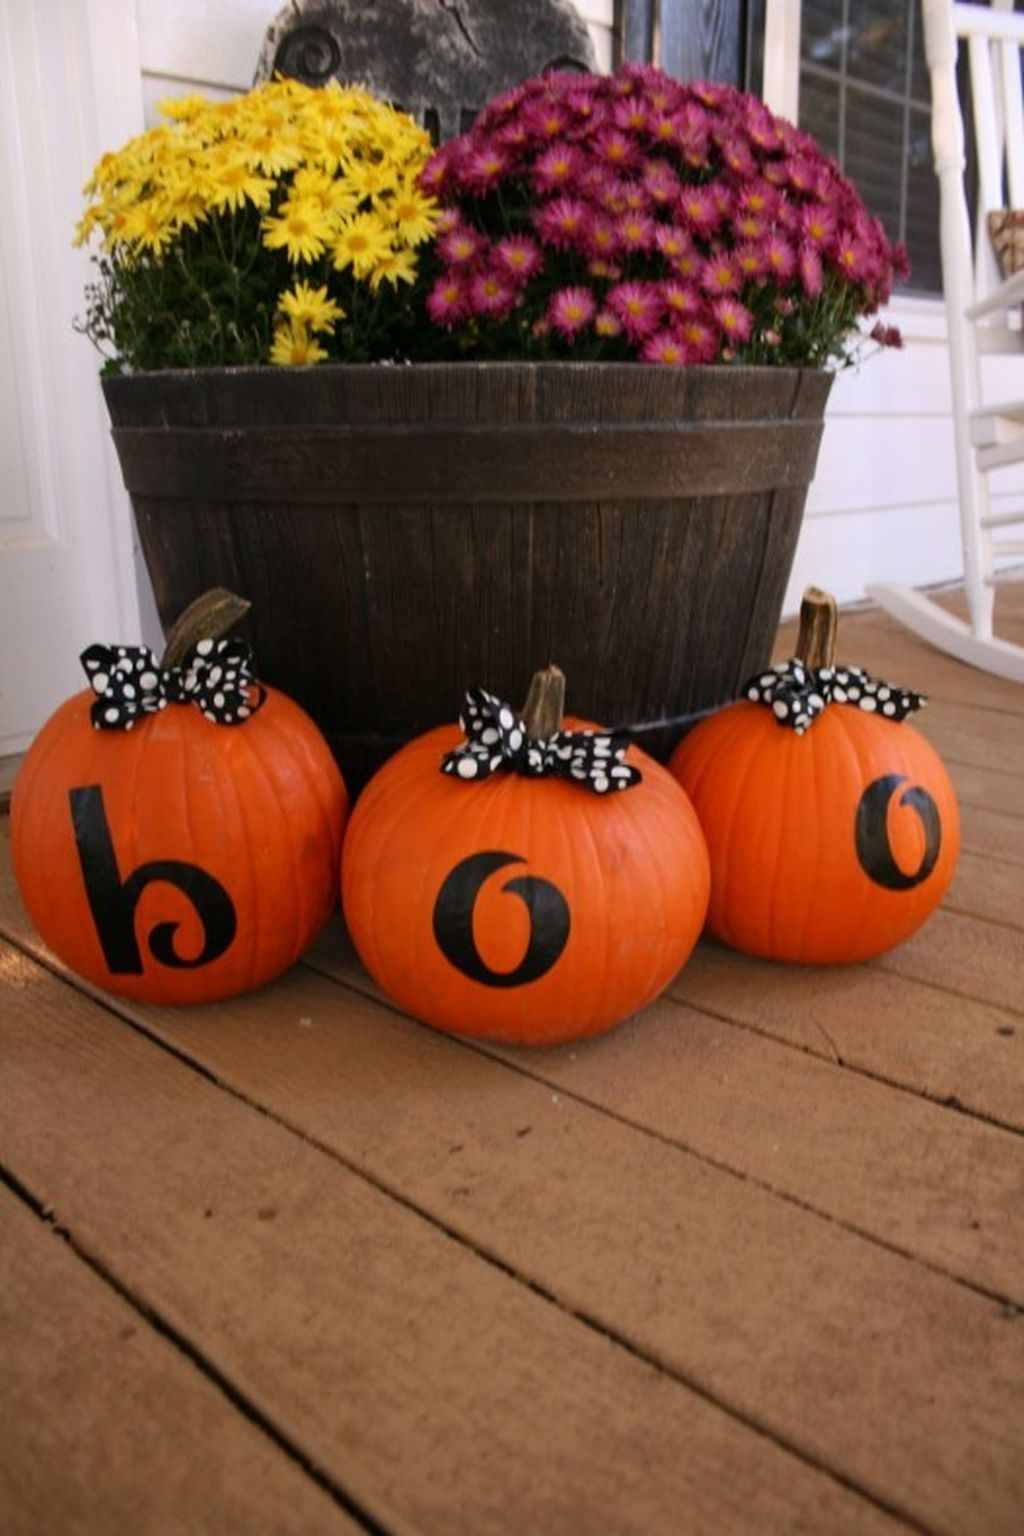 88 Scary Fall Yard Decoration Ideas You Should Try Yard - scary halloween yard decorating ideas